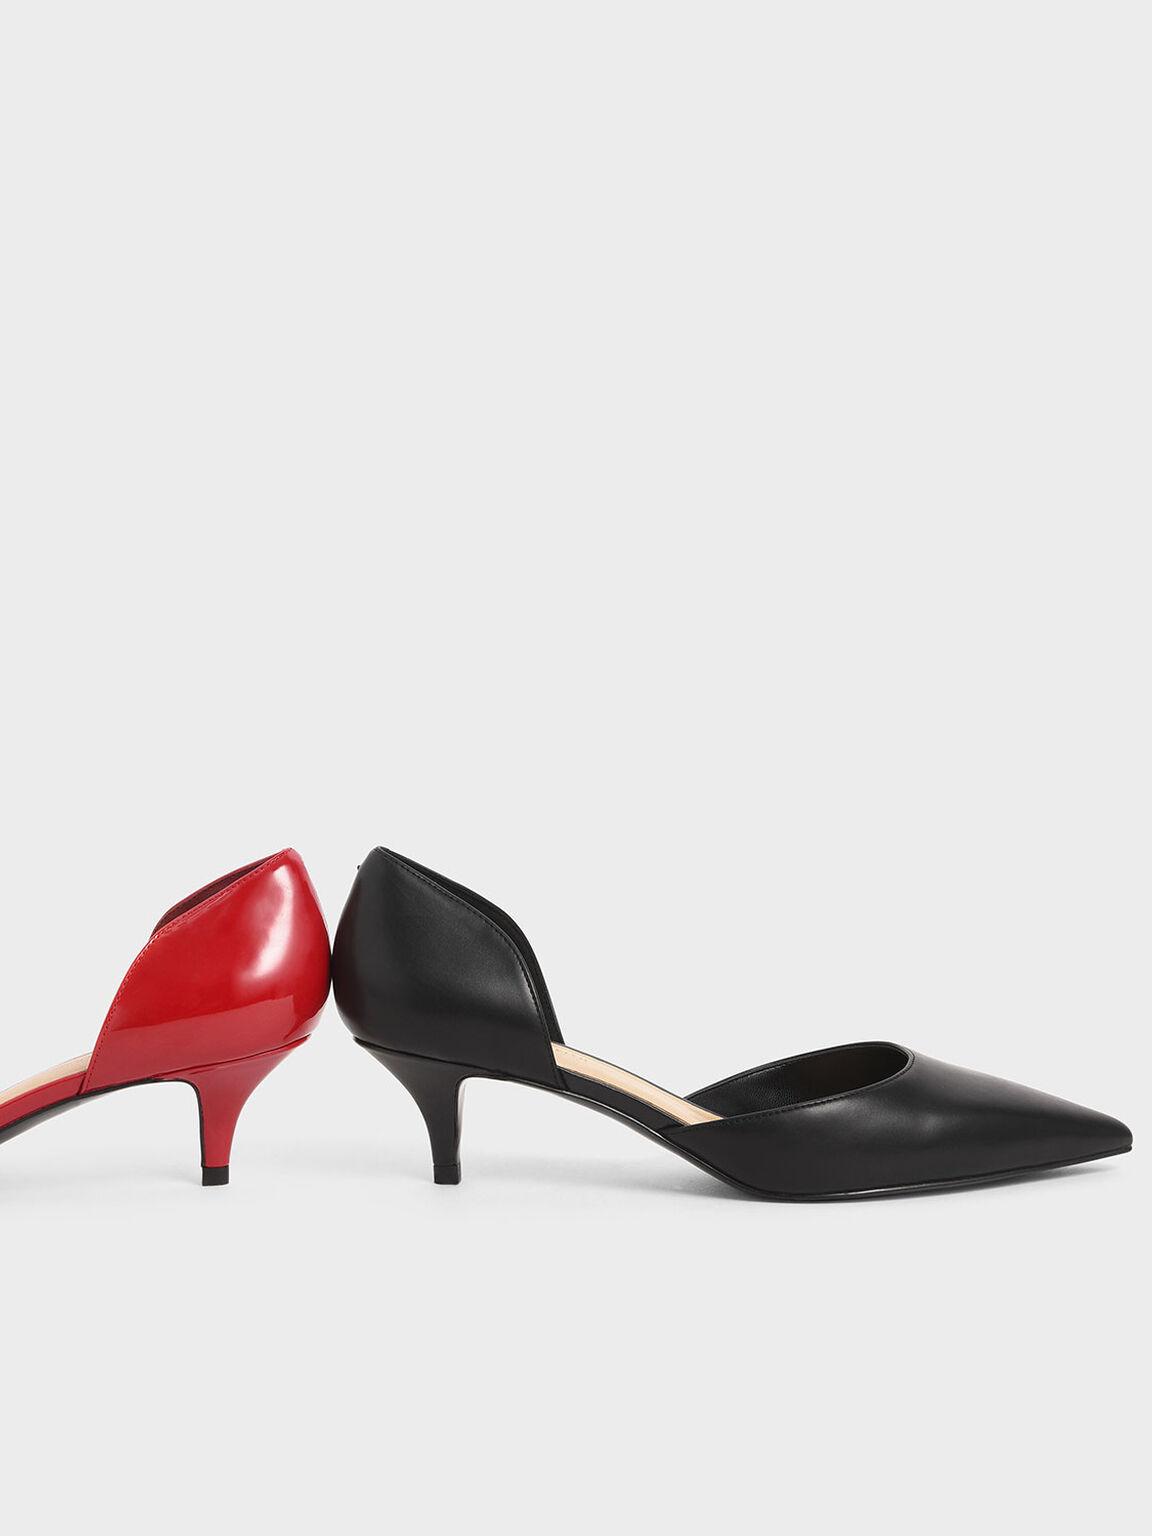 D'Orsay Kitten Heel Pumps, Black, hi-res